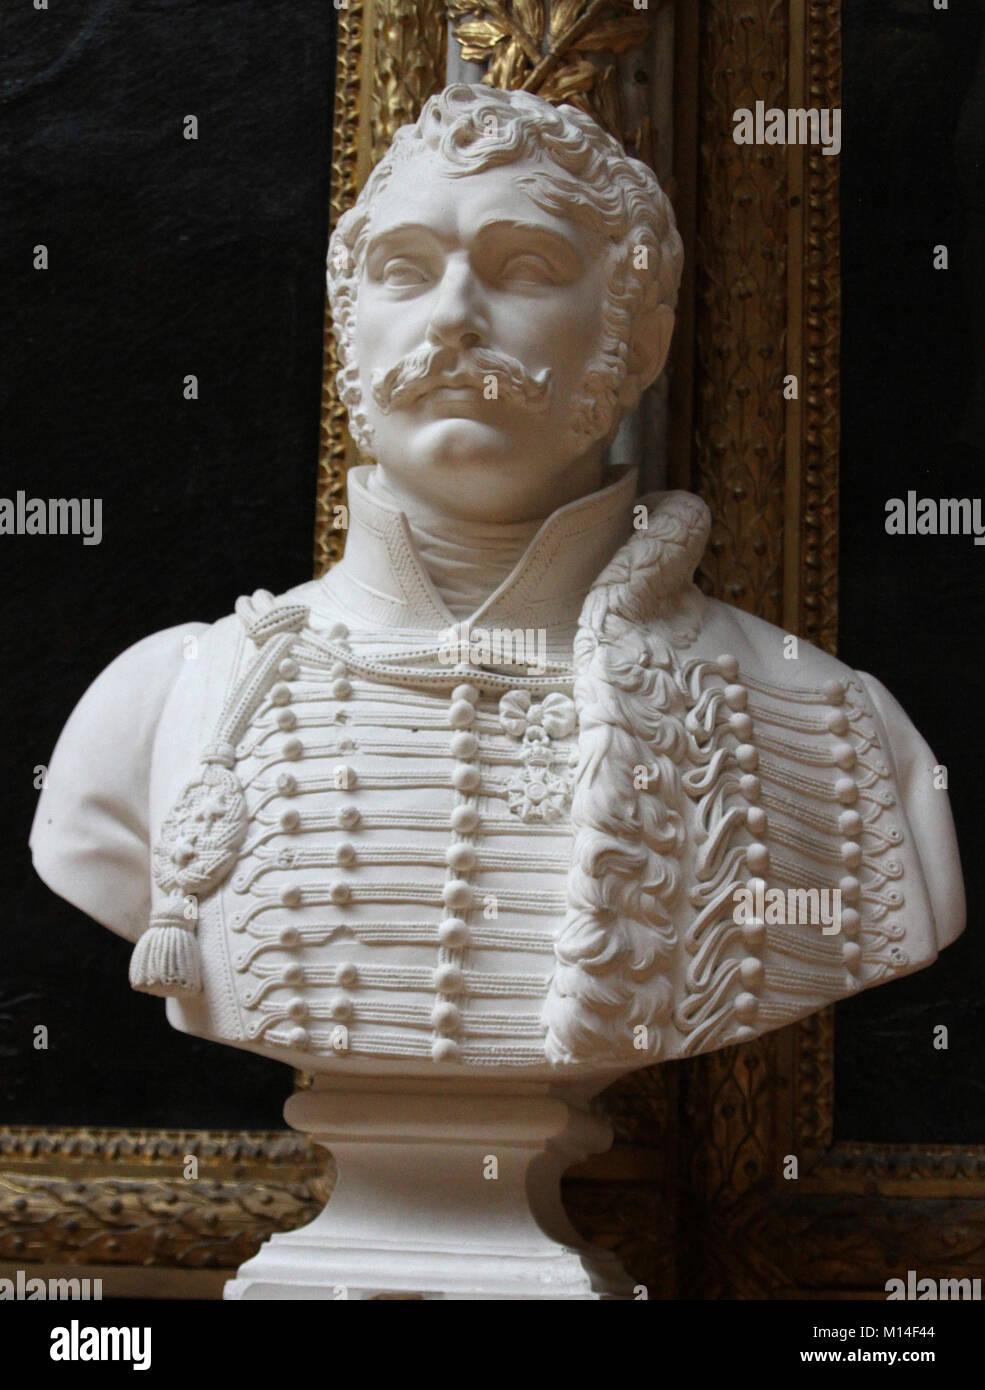 Marble bust of General Antoine Charles Louis de Lasalle by Auguste Marie Taunay in the Gallery of battles, Versailles Stock Photo